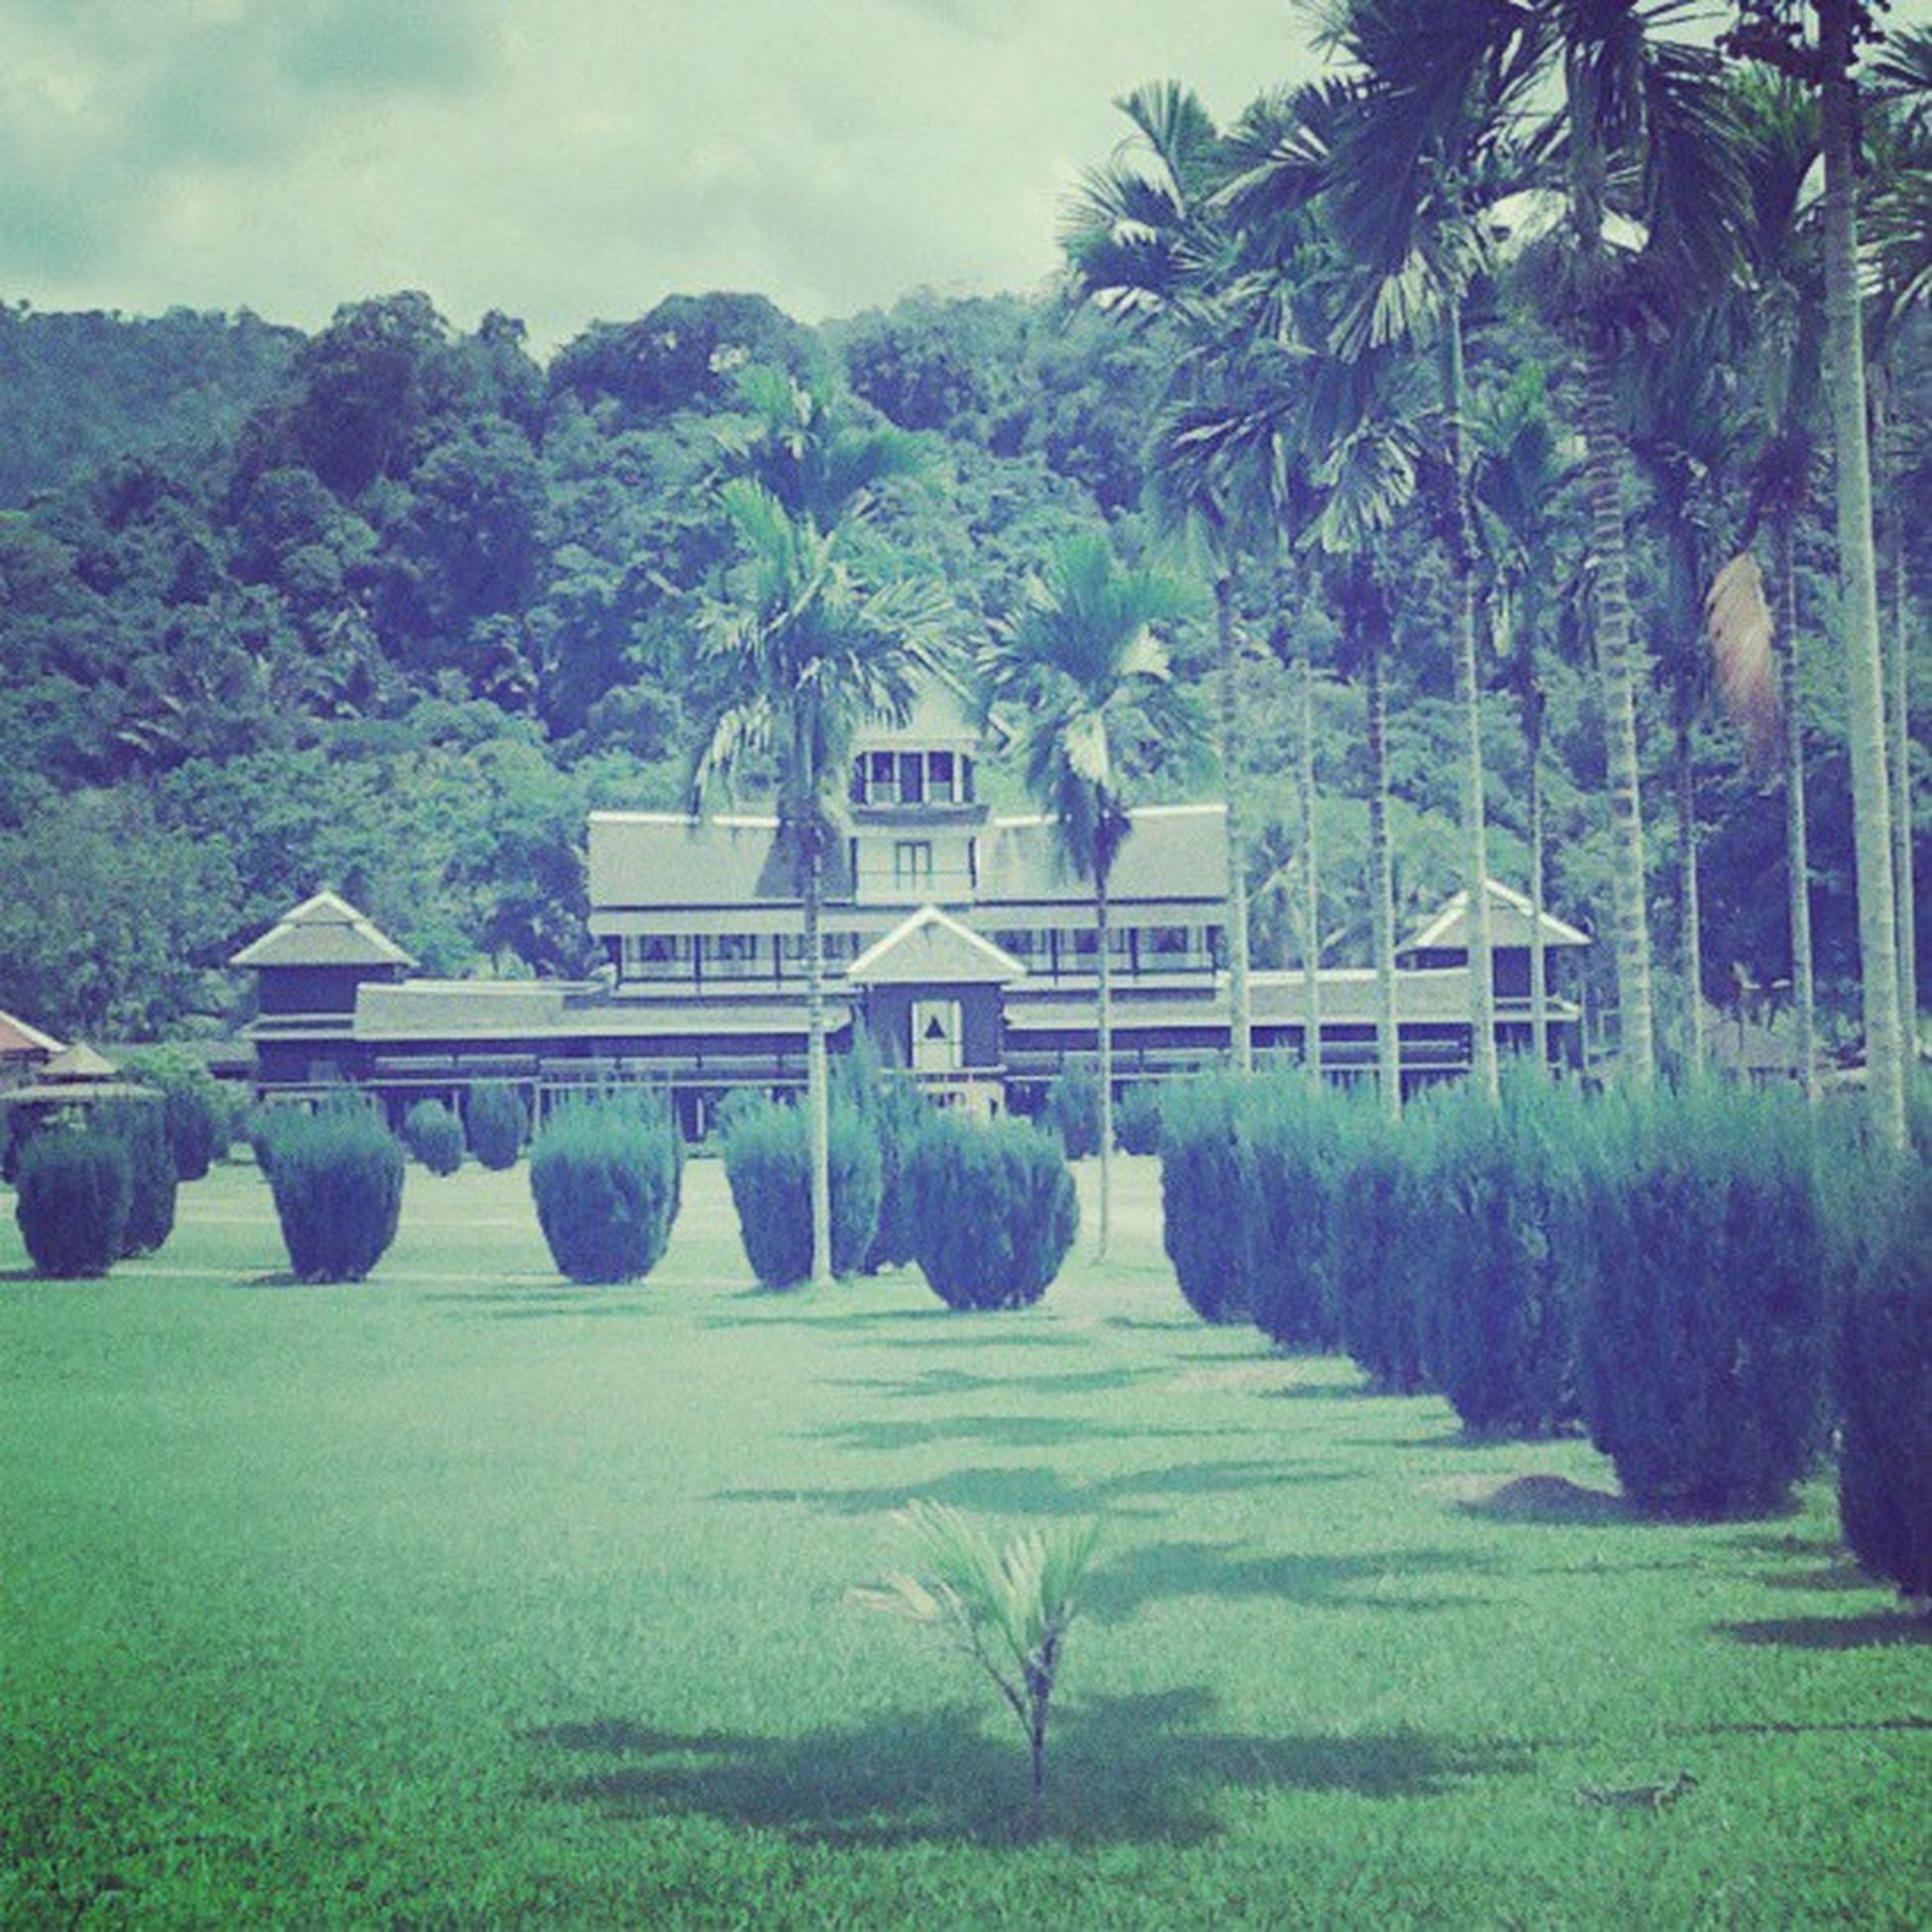 I'm here at Serimenanti Istanalama Negerisembilan